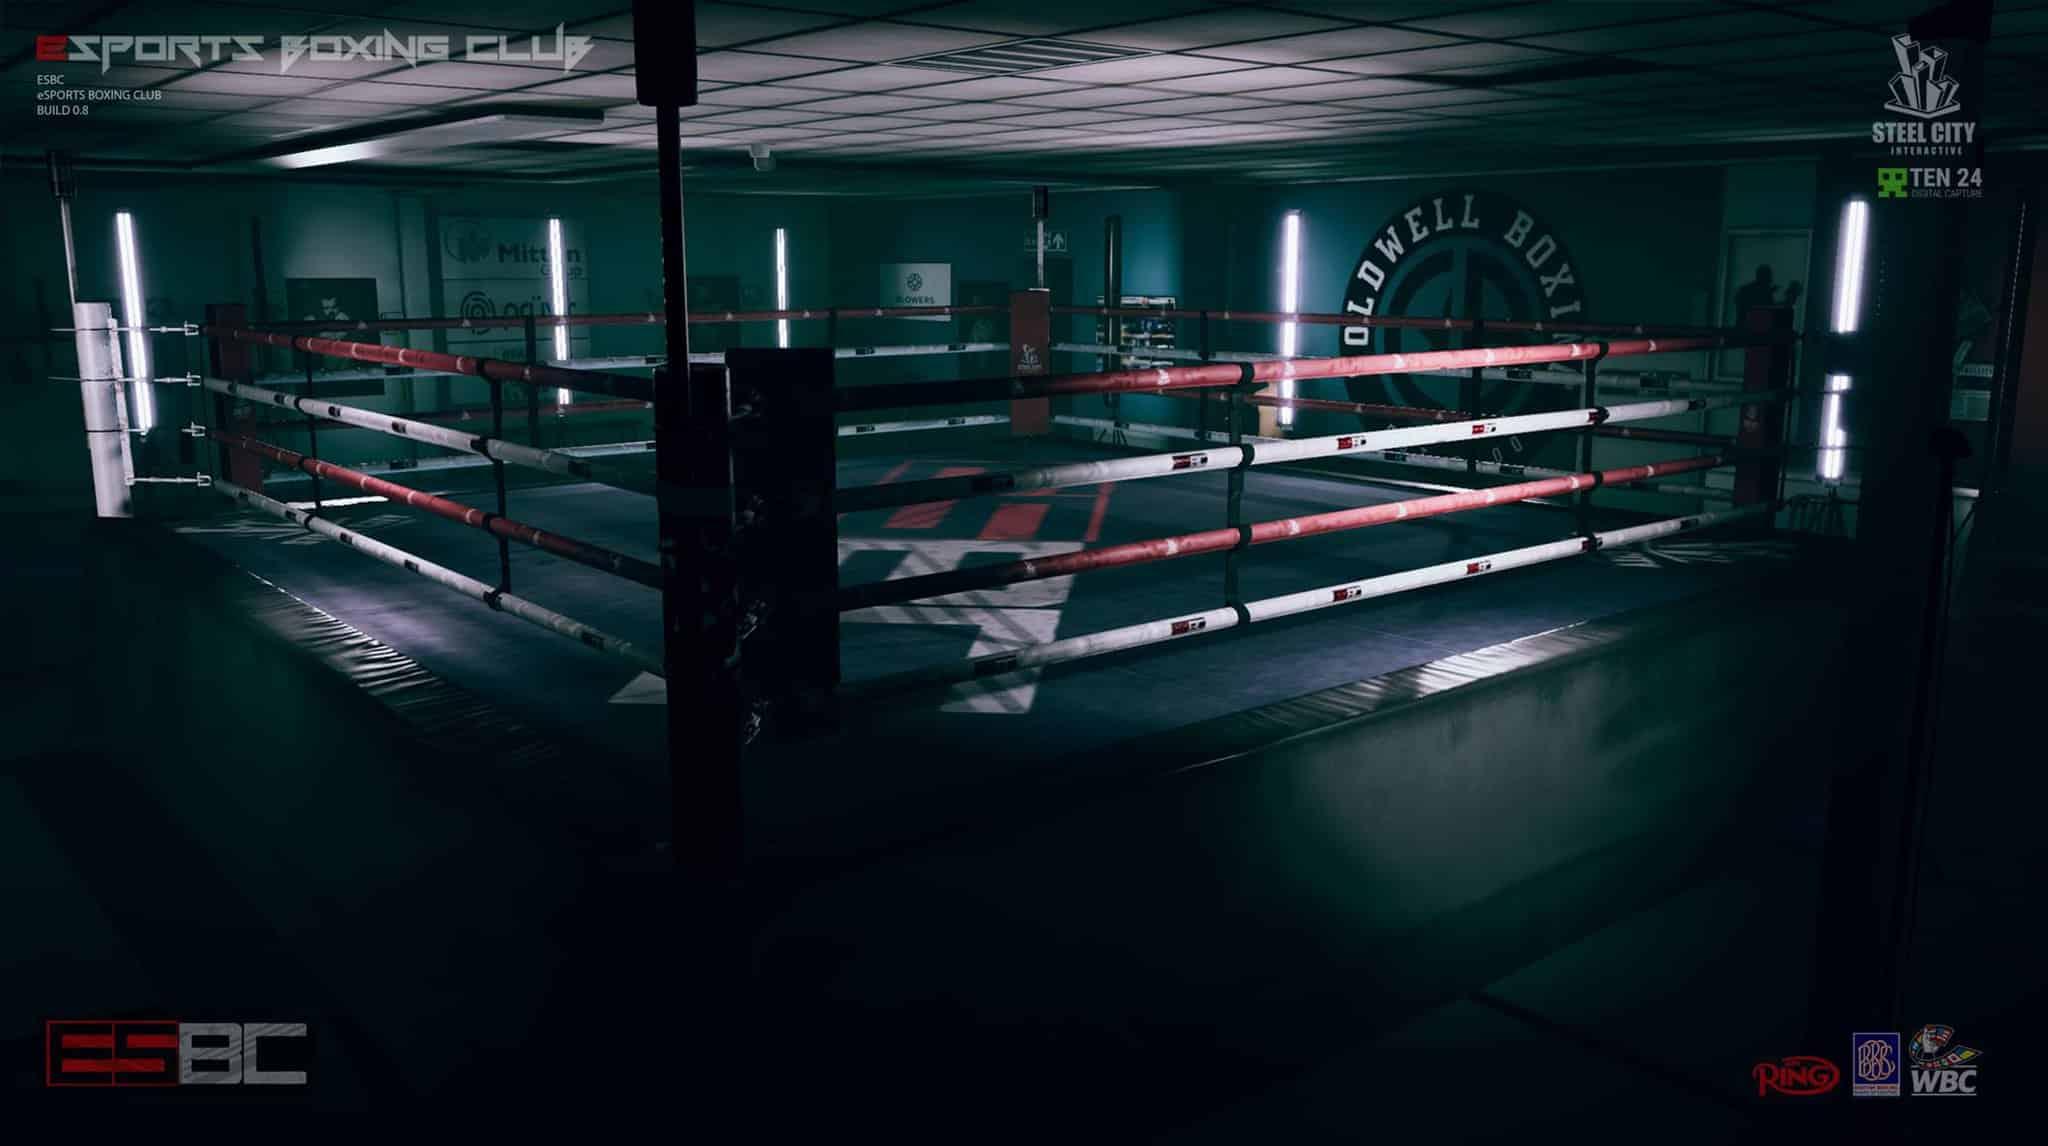 eSports Boxing Club ESBC